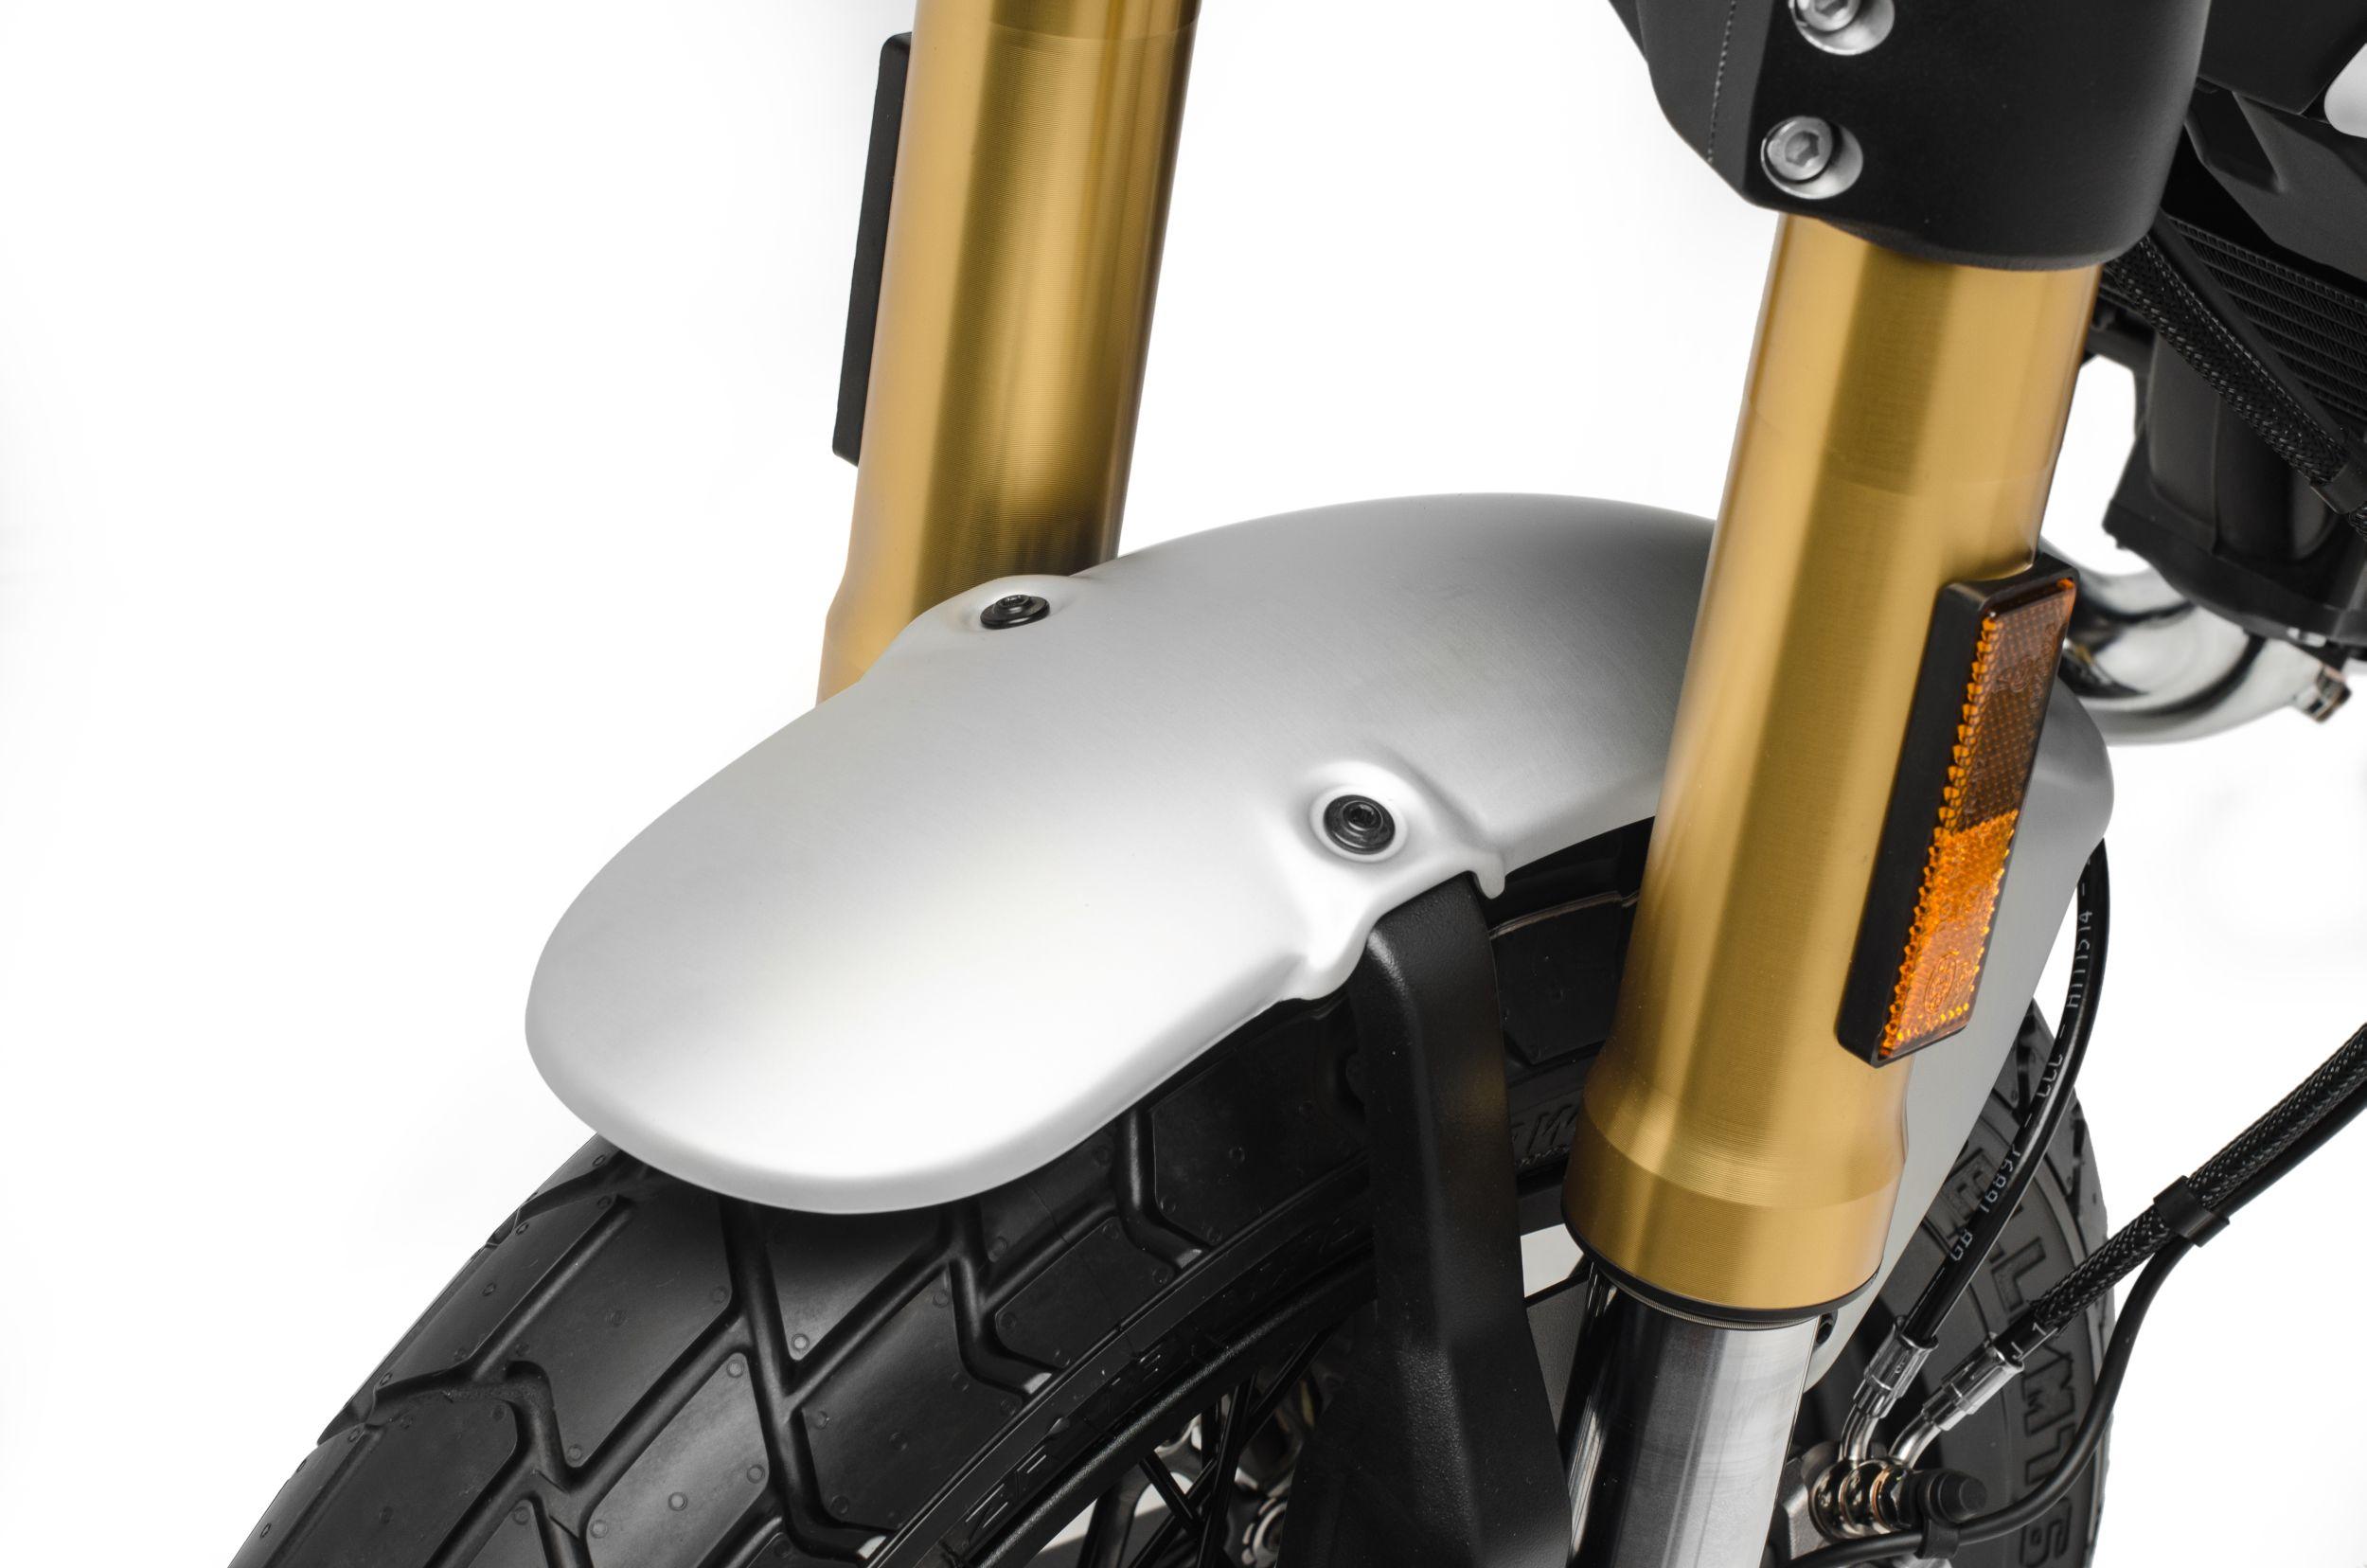 Ducati Scrambler 1100 Special - Alle technischen Daten zum Modell ...